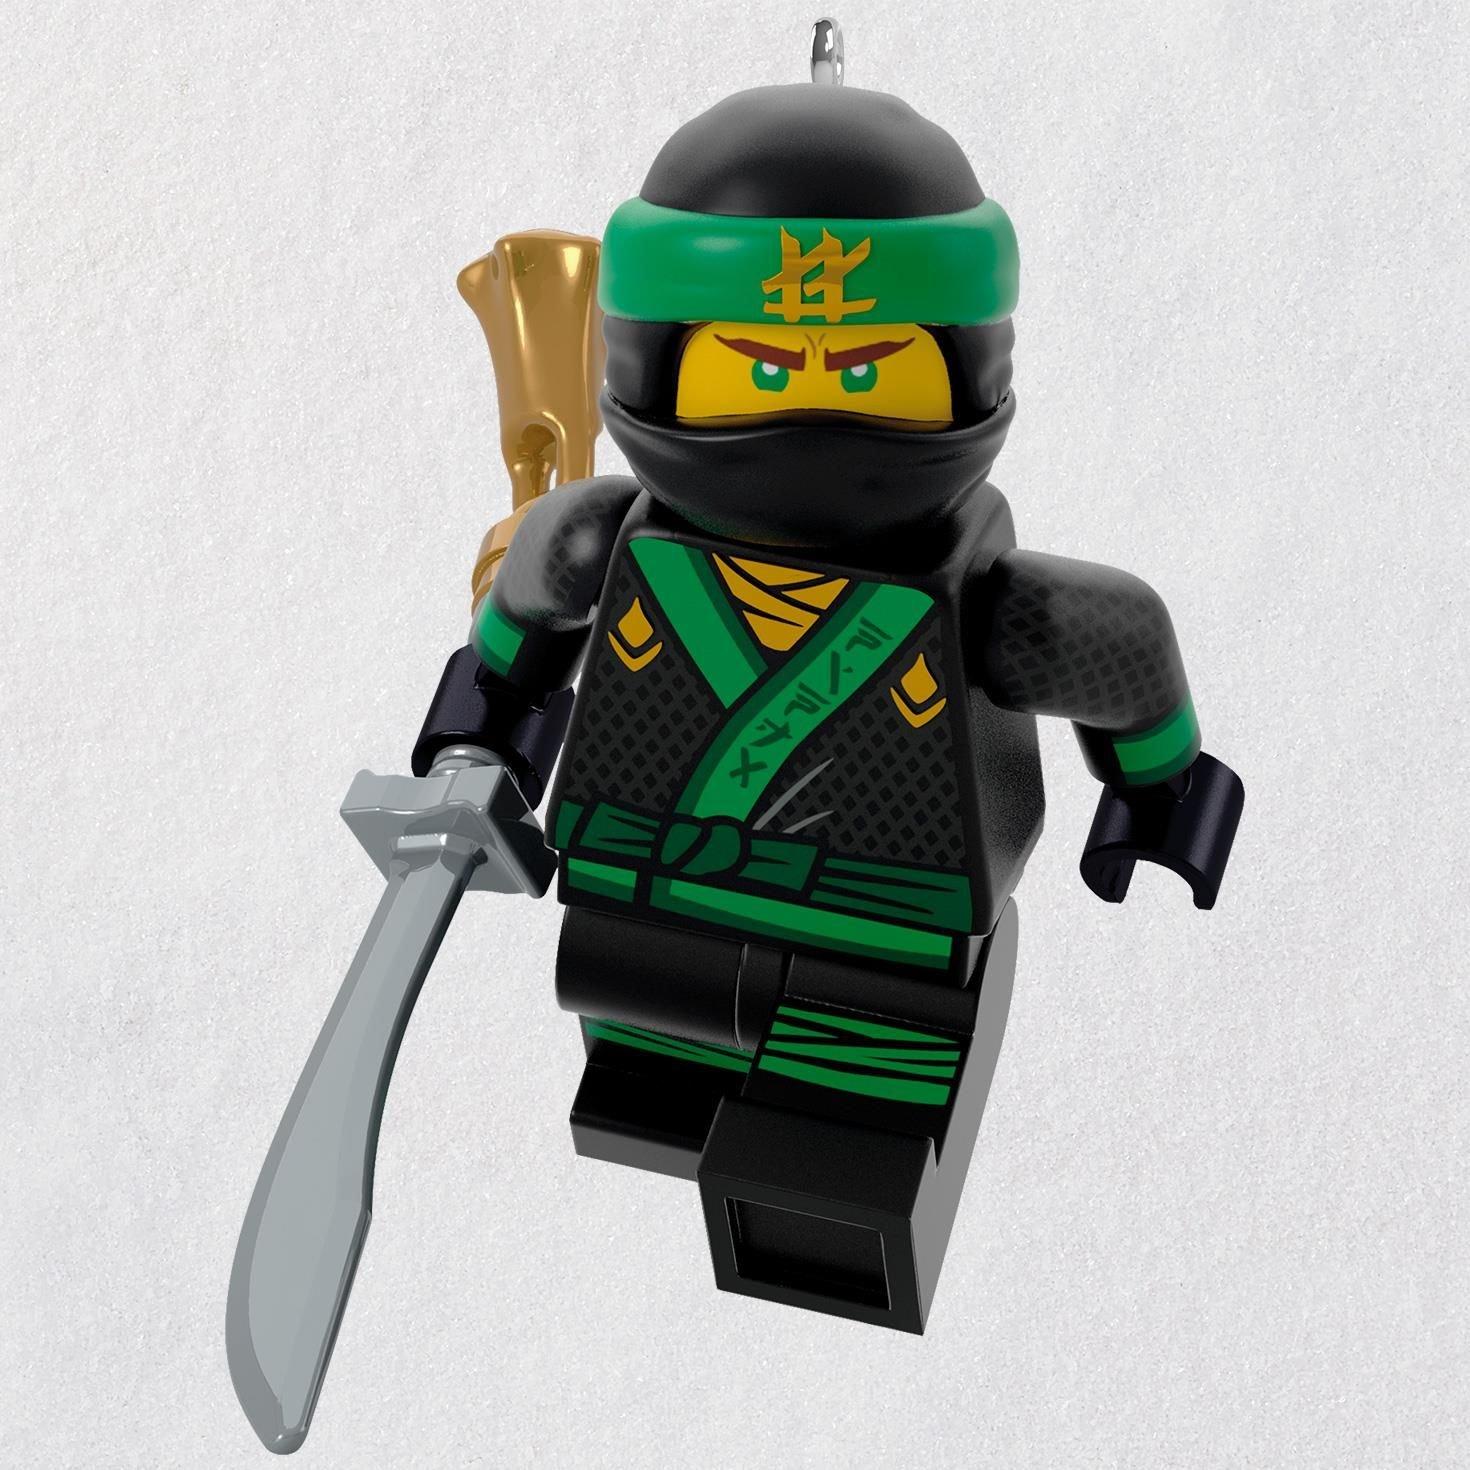 Hallmark THE LEGO NINJAGO MOVIE Lloyd Ornament keepsake-ornaments Movies & TV,Teen,Toys & Gaming